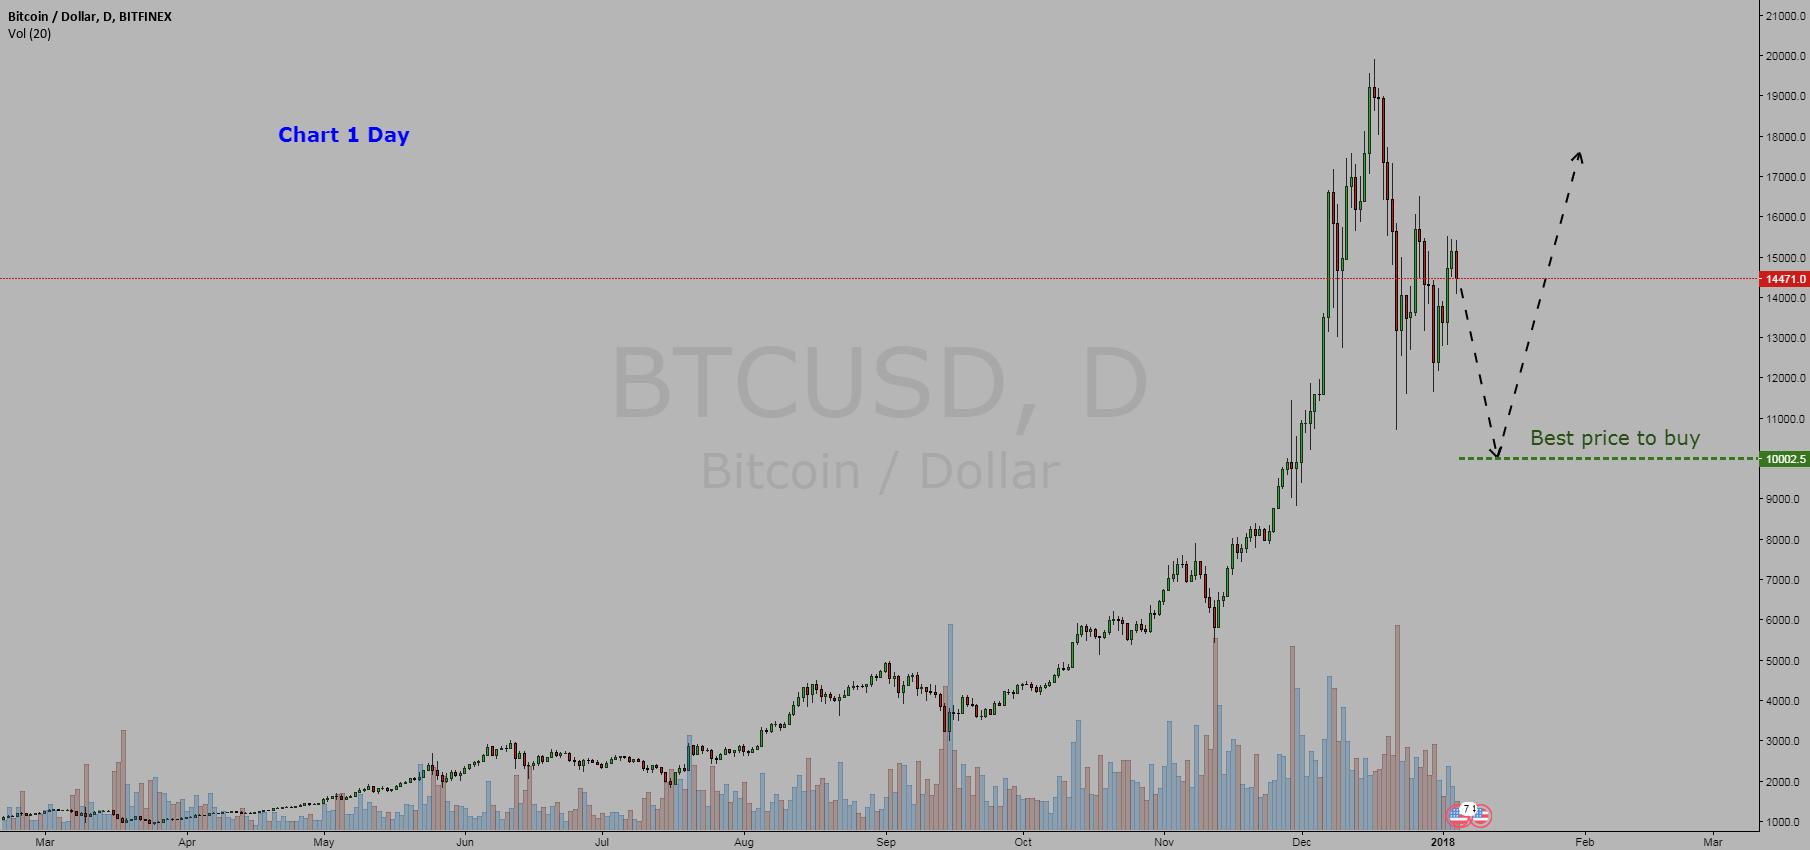 Crypto currency  Bitcoin / Dollar  =  BUY